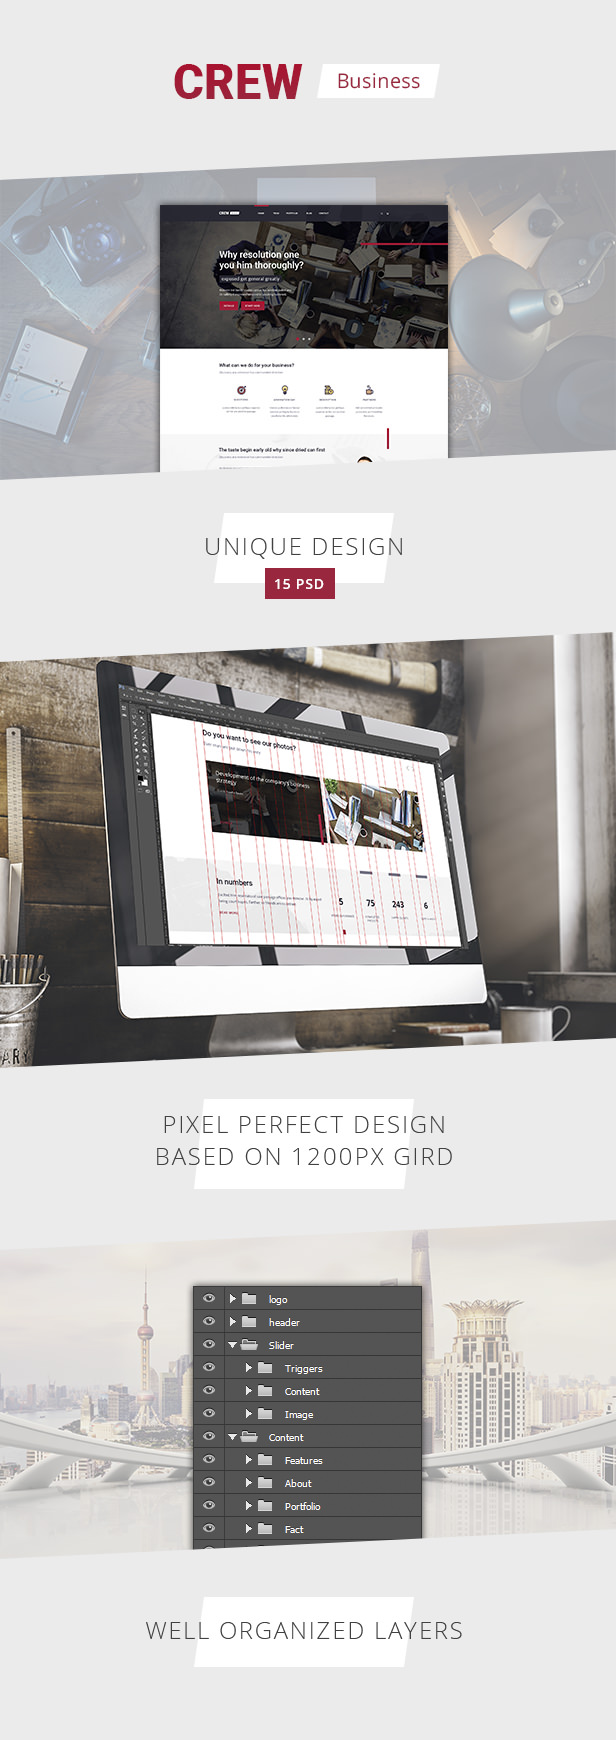 Crew �� Business, Corporate Portfolio & Blog PSD Template - 1